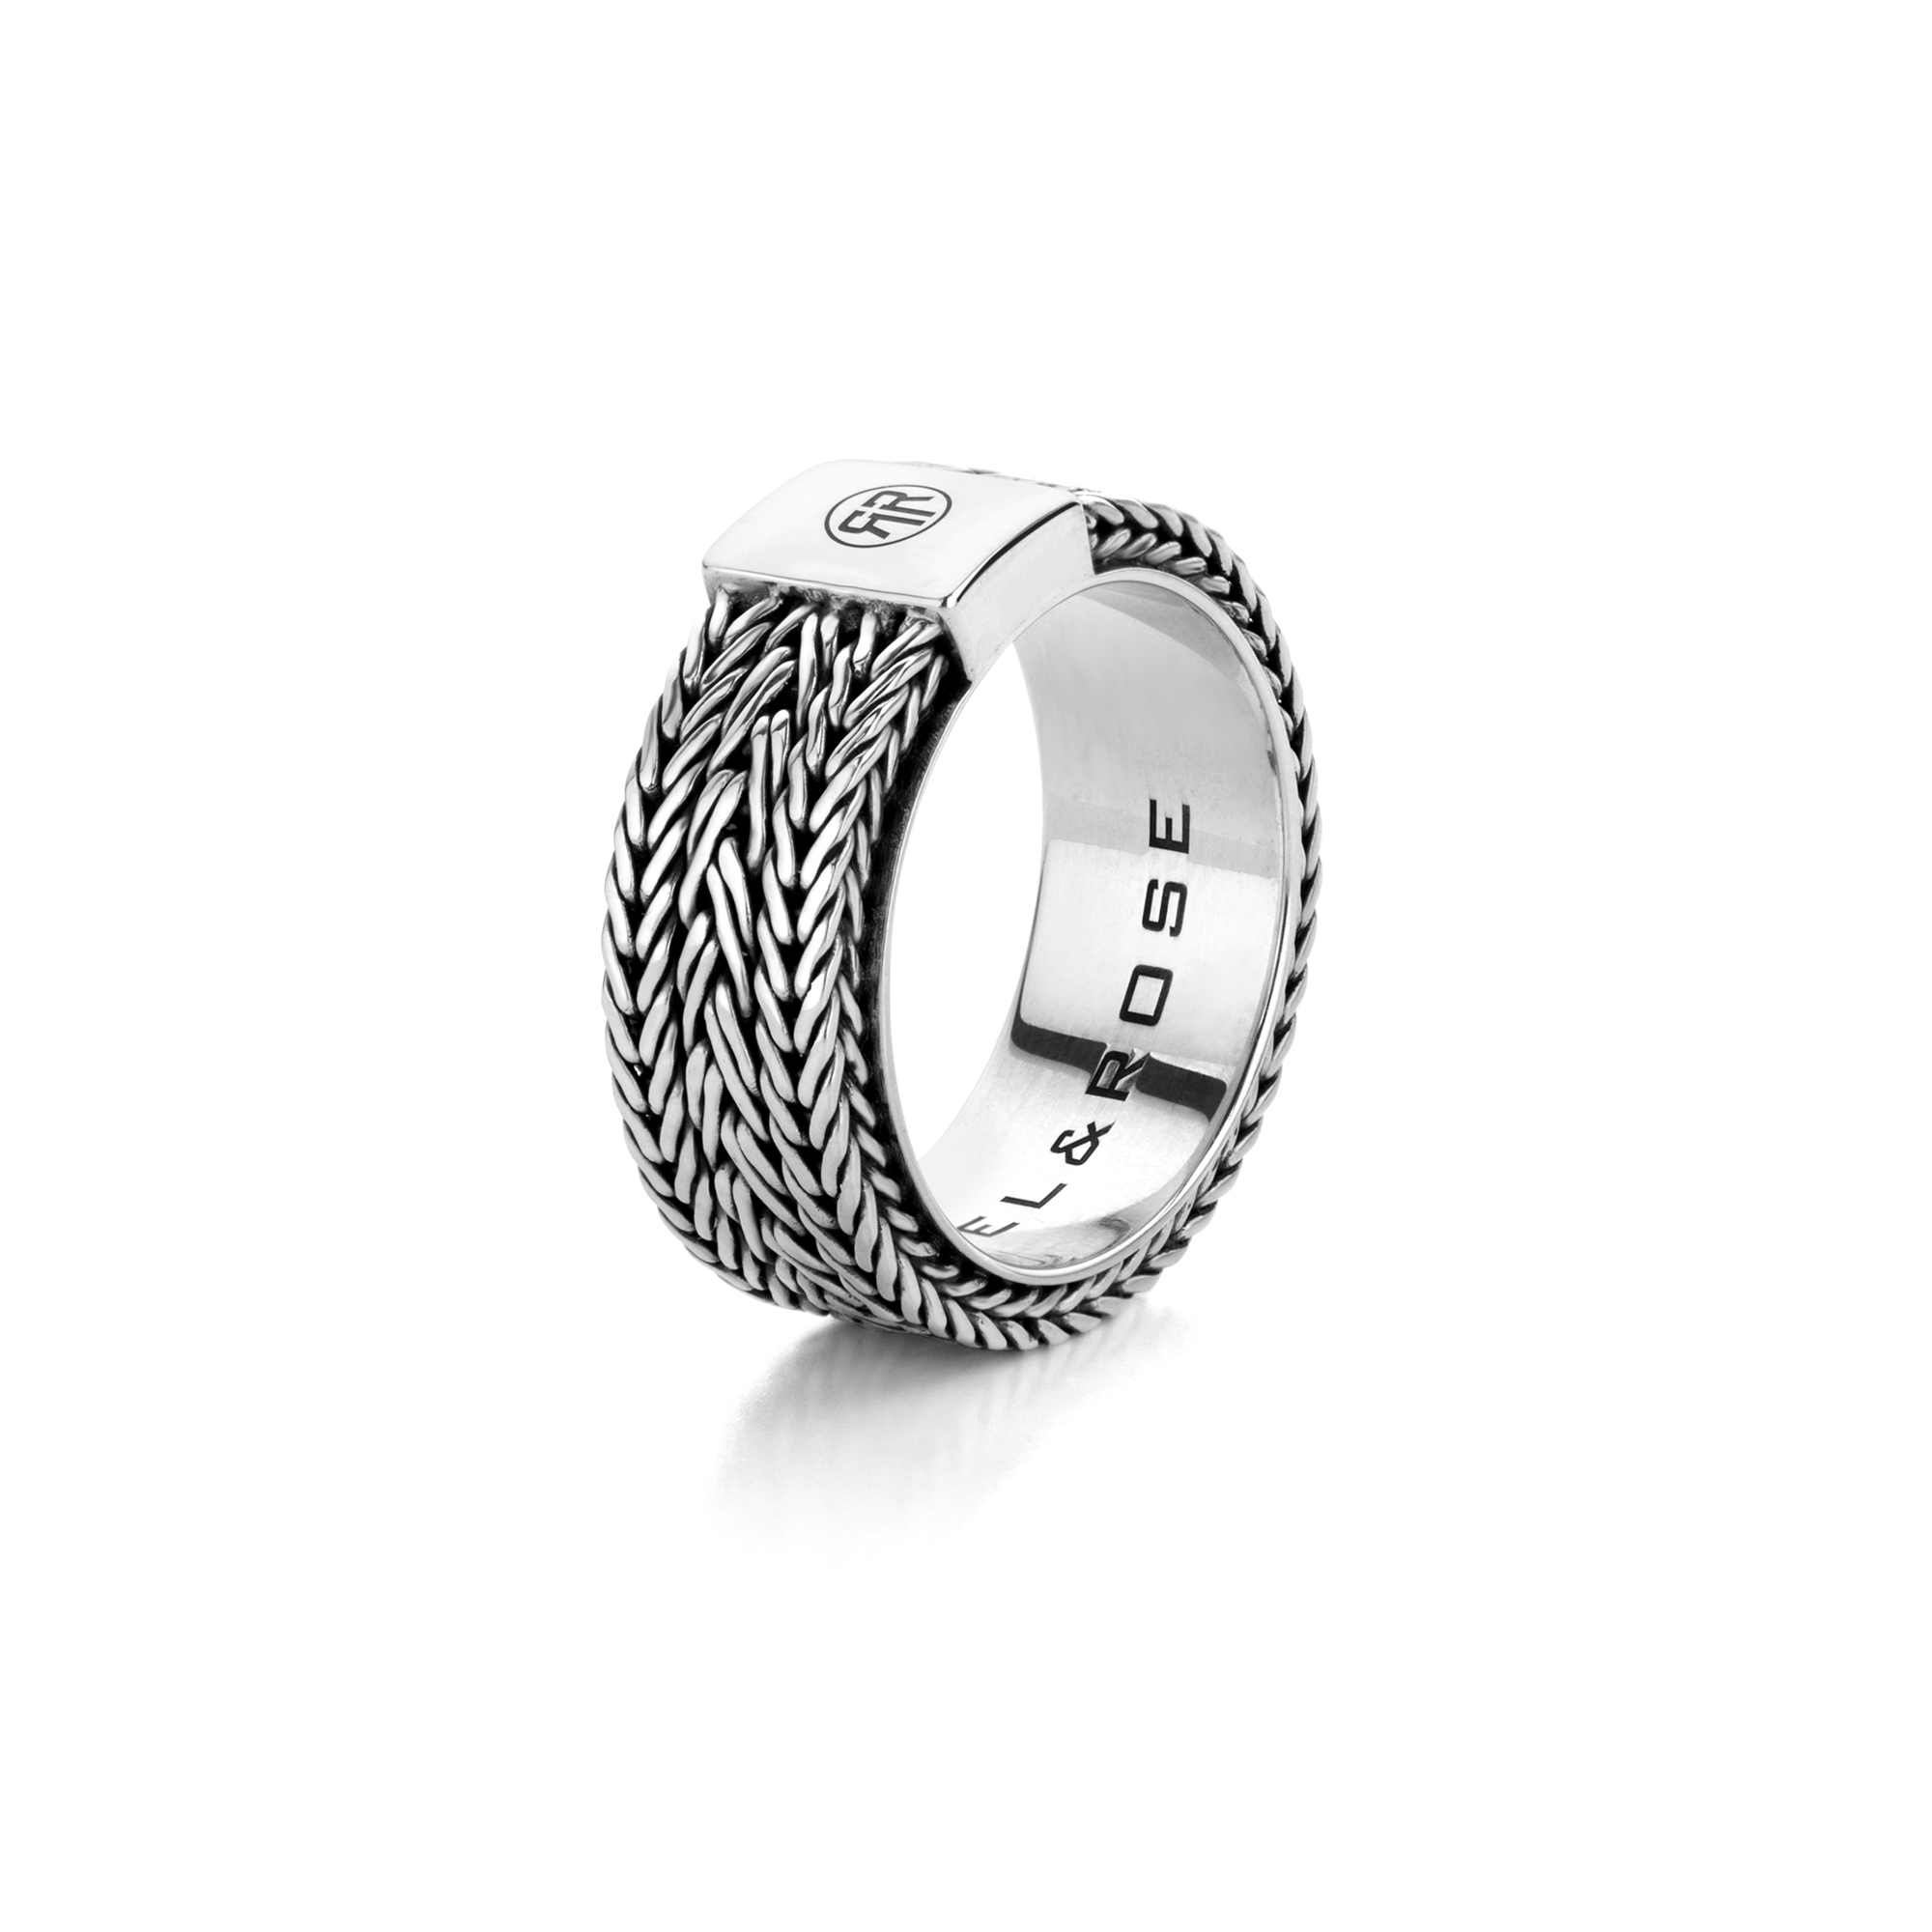 Rebel and Rose RR RG020 S Ring Triton zilver Maat 60